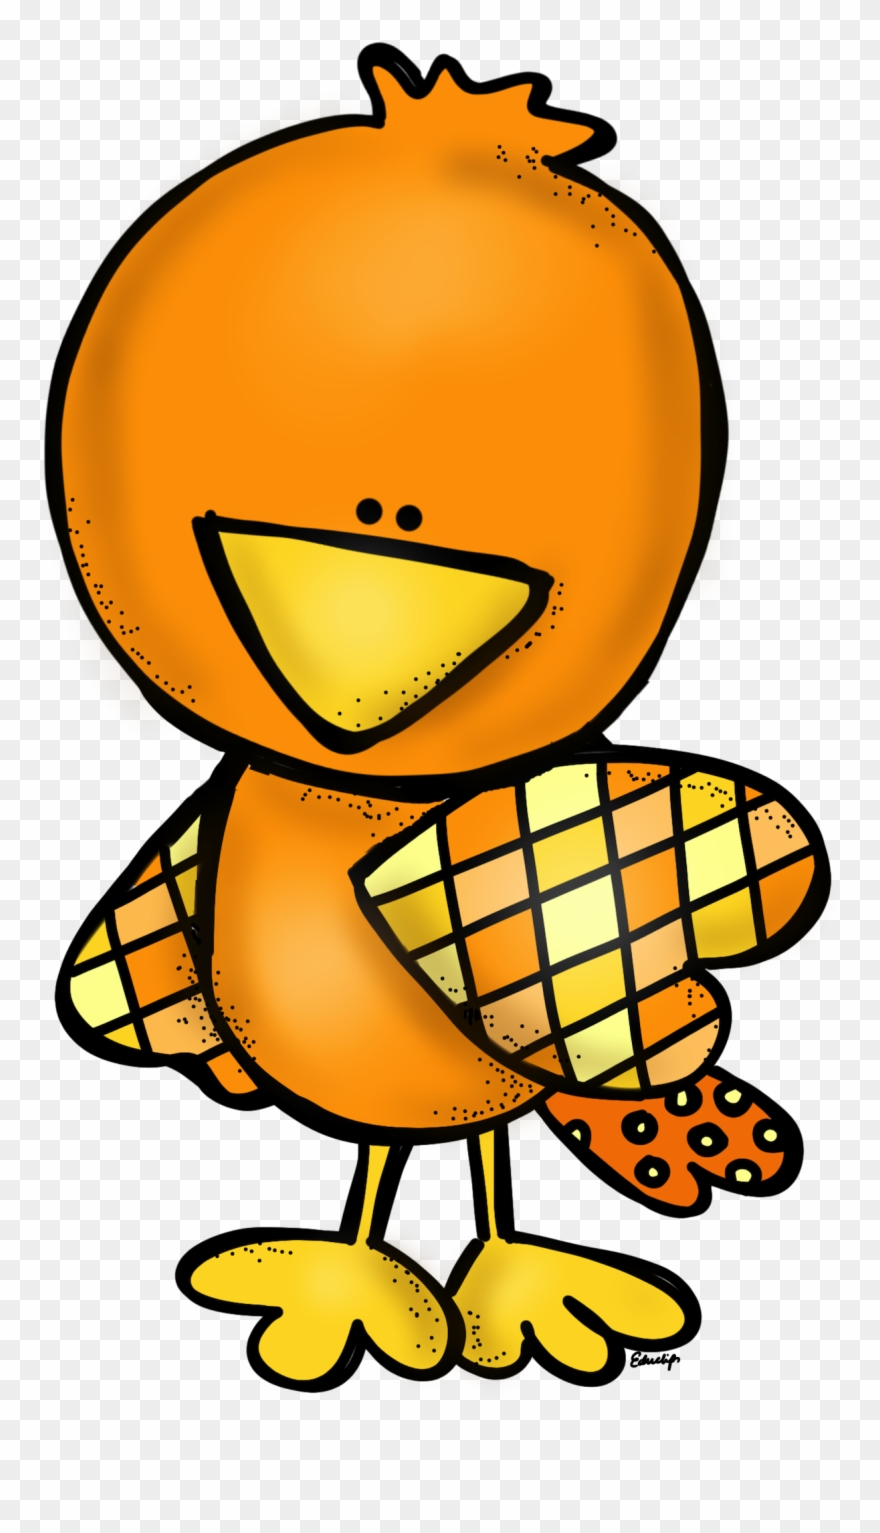 Melonheadz clipart bird.  pajaros y jaulas